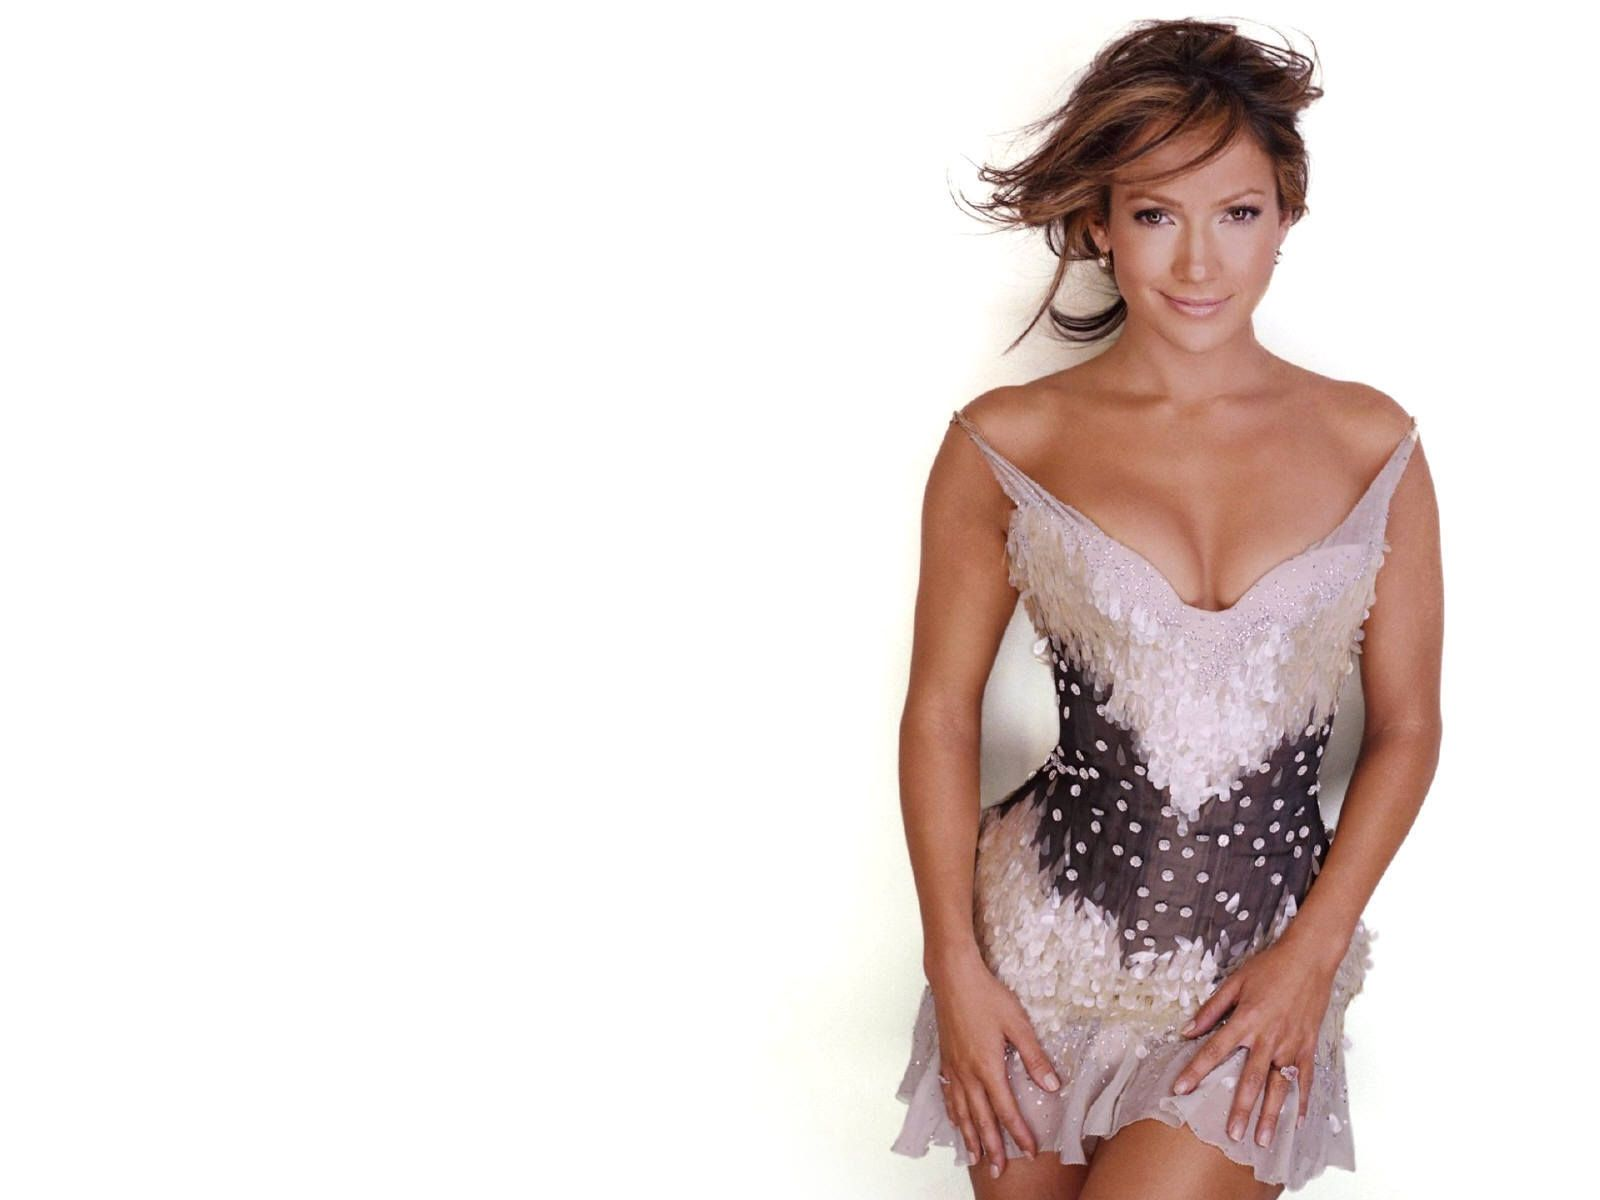 Jennifer Lopez Hd Desktop Wallpaper High Definition Jennifer Lopez Jennifer Lopez Photos Jenifer Lopez